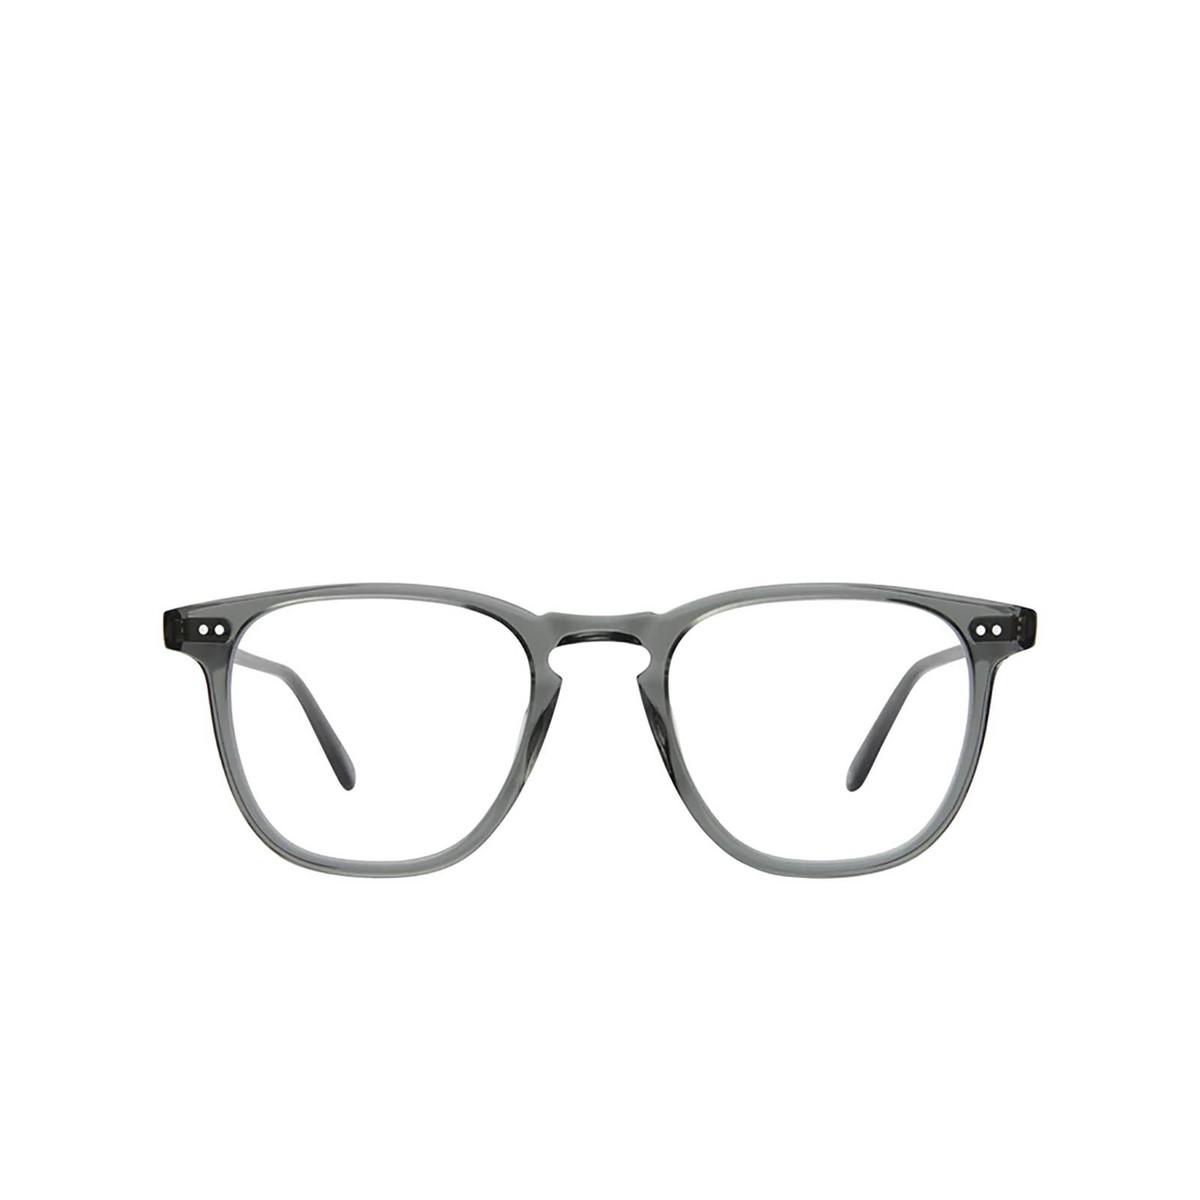 Garrett Leight® Square Eyeglasses: Brooks color Sea Grey Sgy - front view.